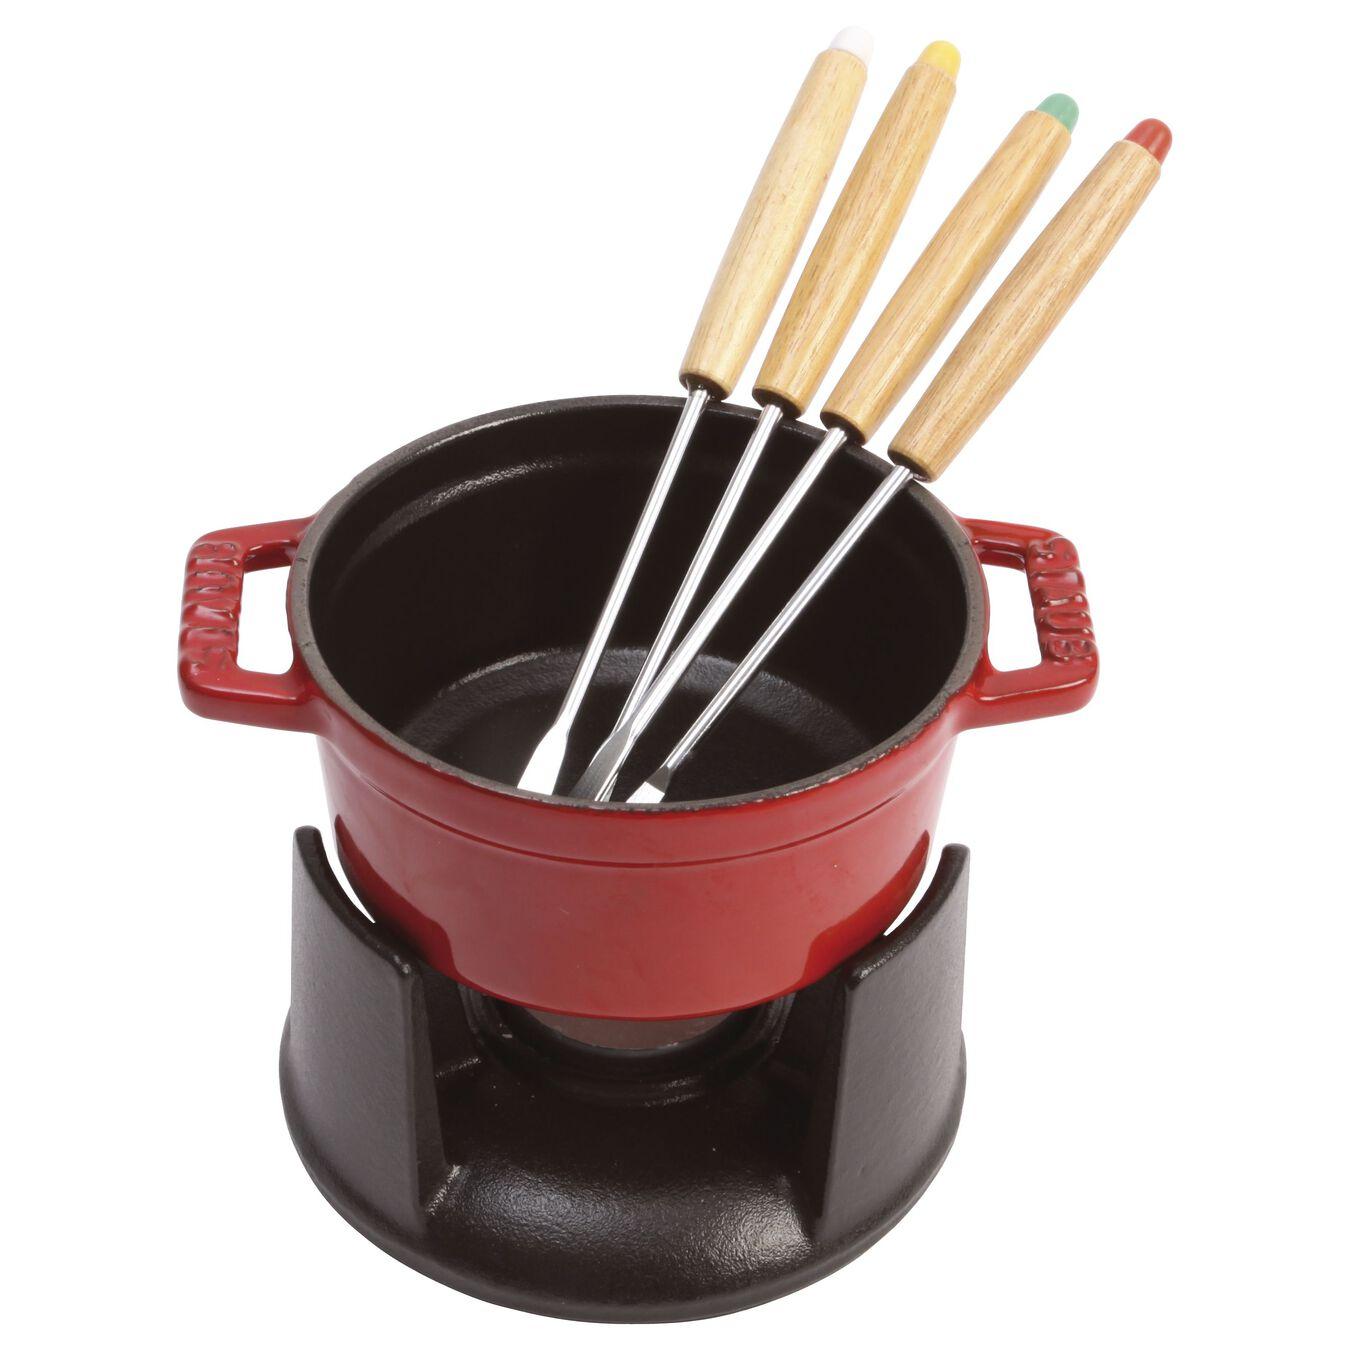 Service à fondue 10 cm, Cerise, Fonte,,large 1